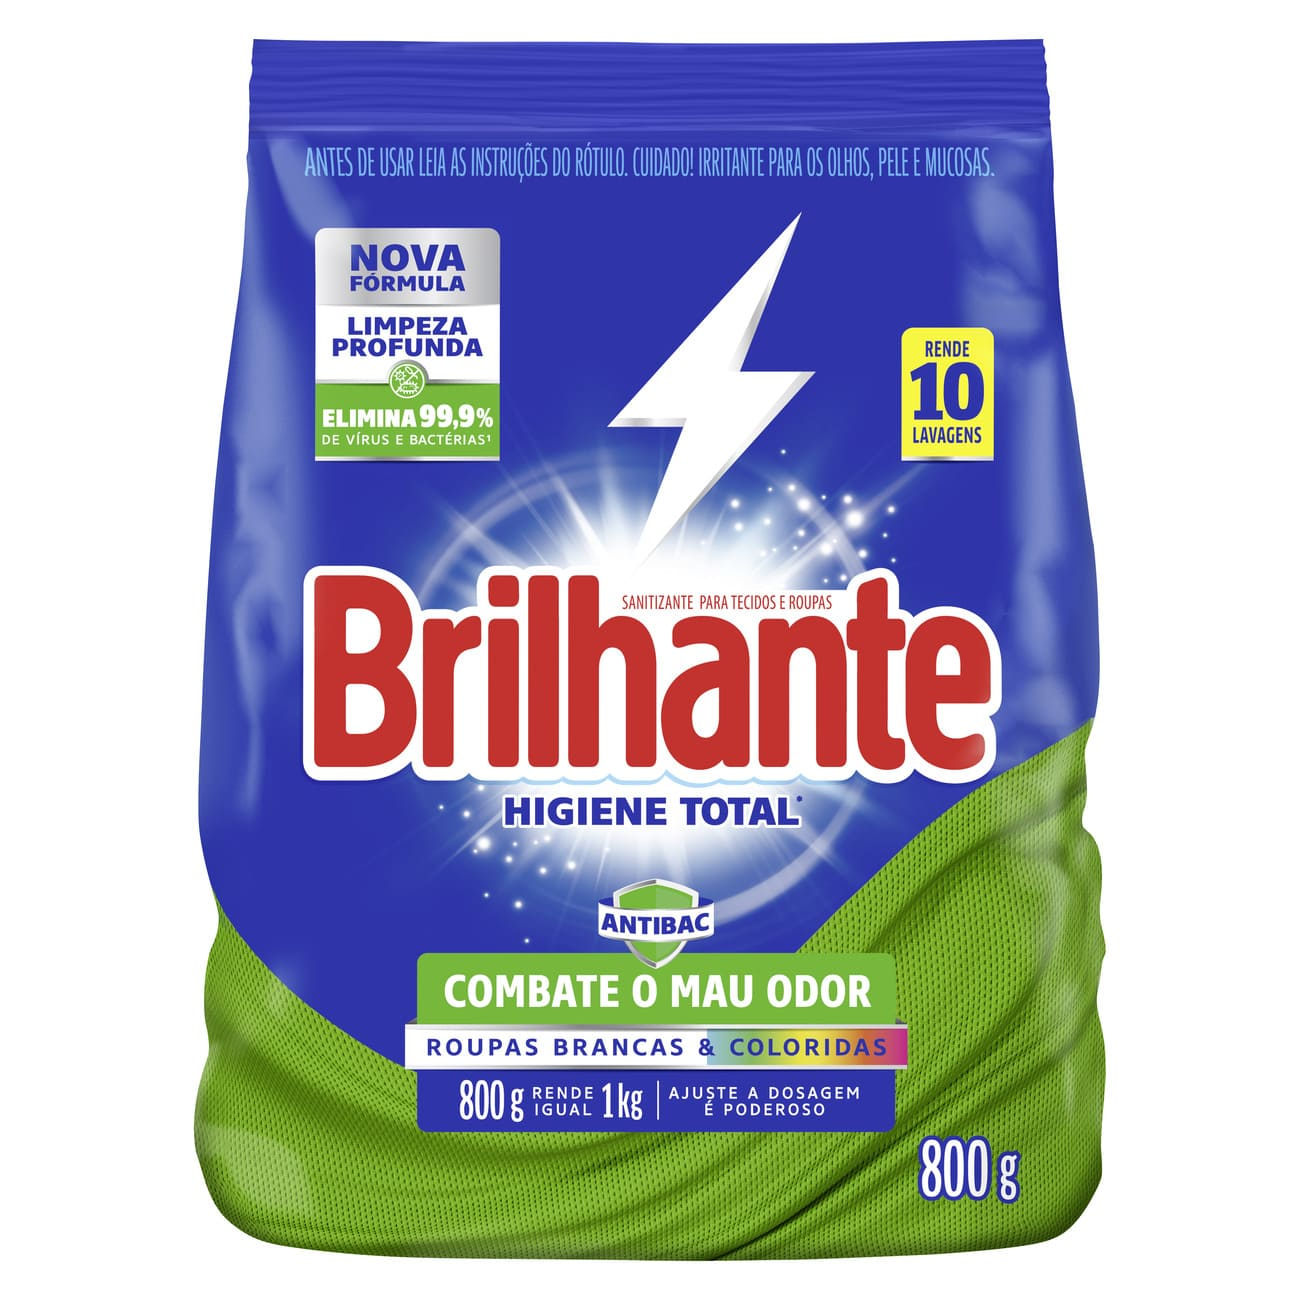 Lava-Roupas em Pó  Brilhante Desinfetante Roupas Brancas e Coloridas Higiene Total Pacote 800g